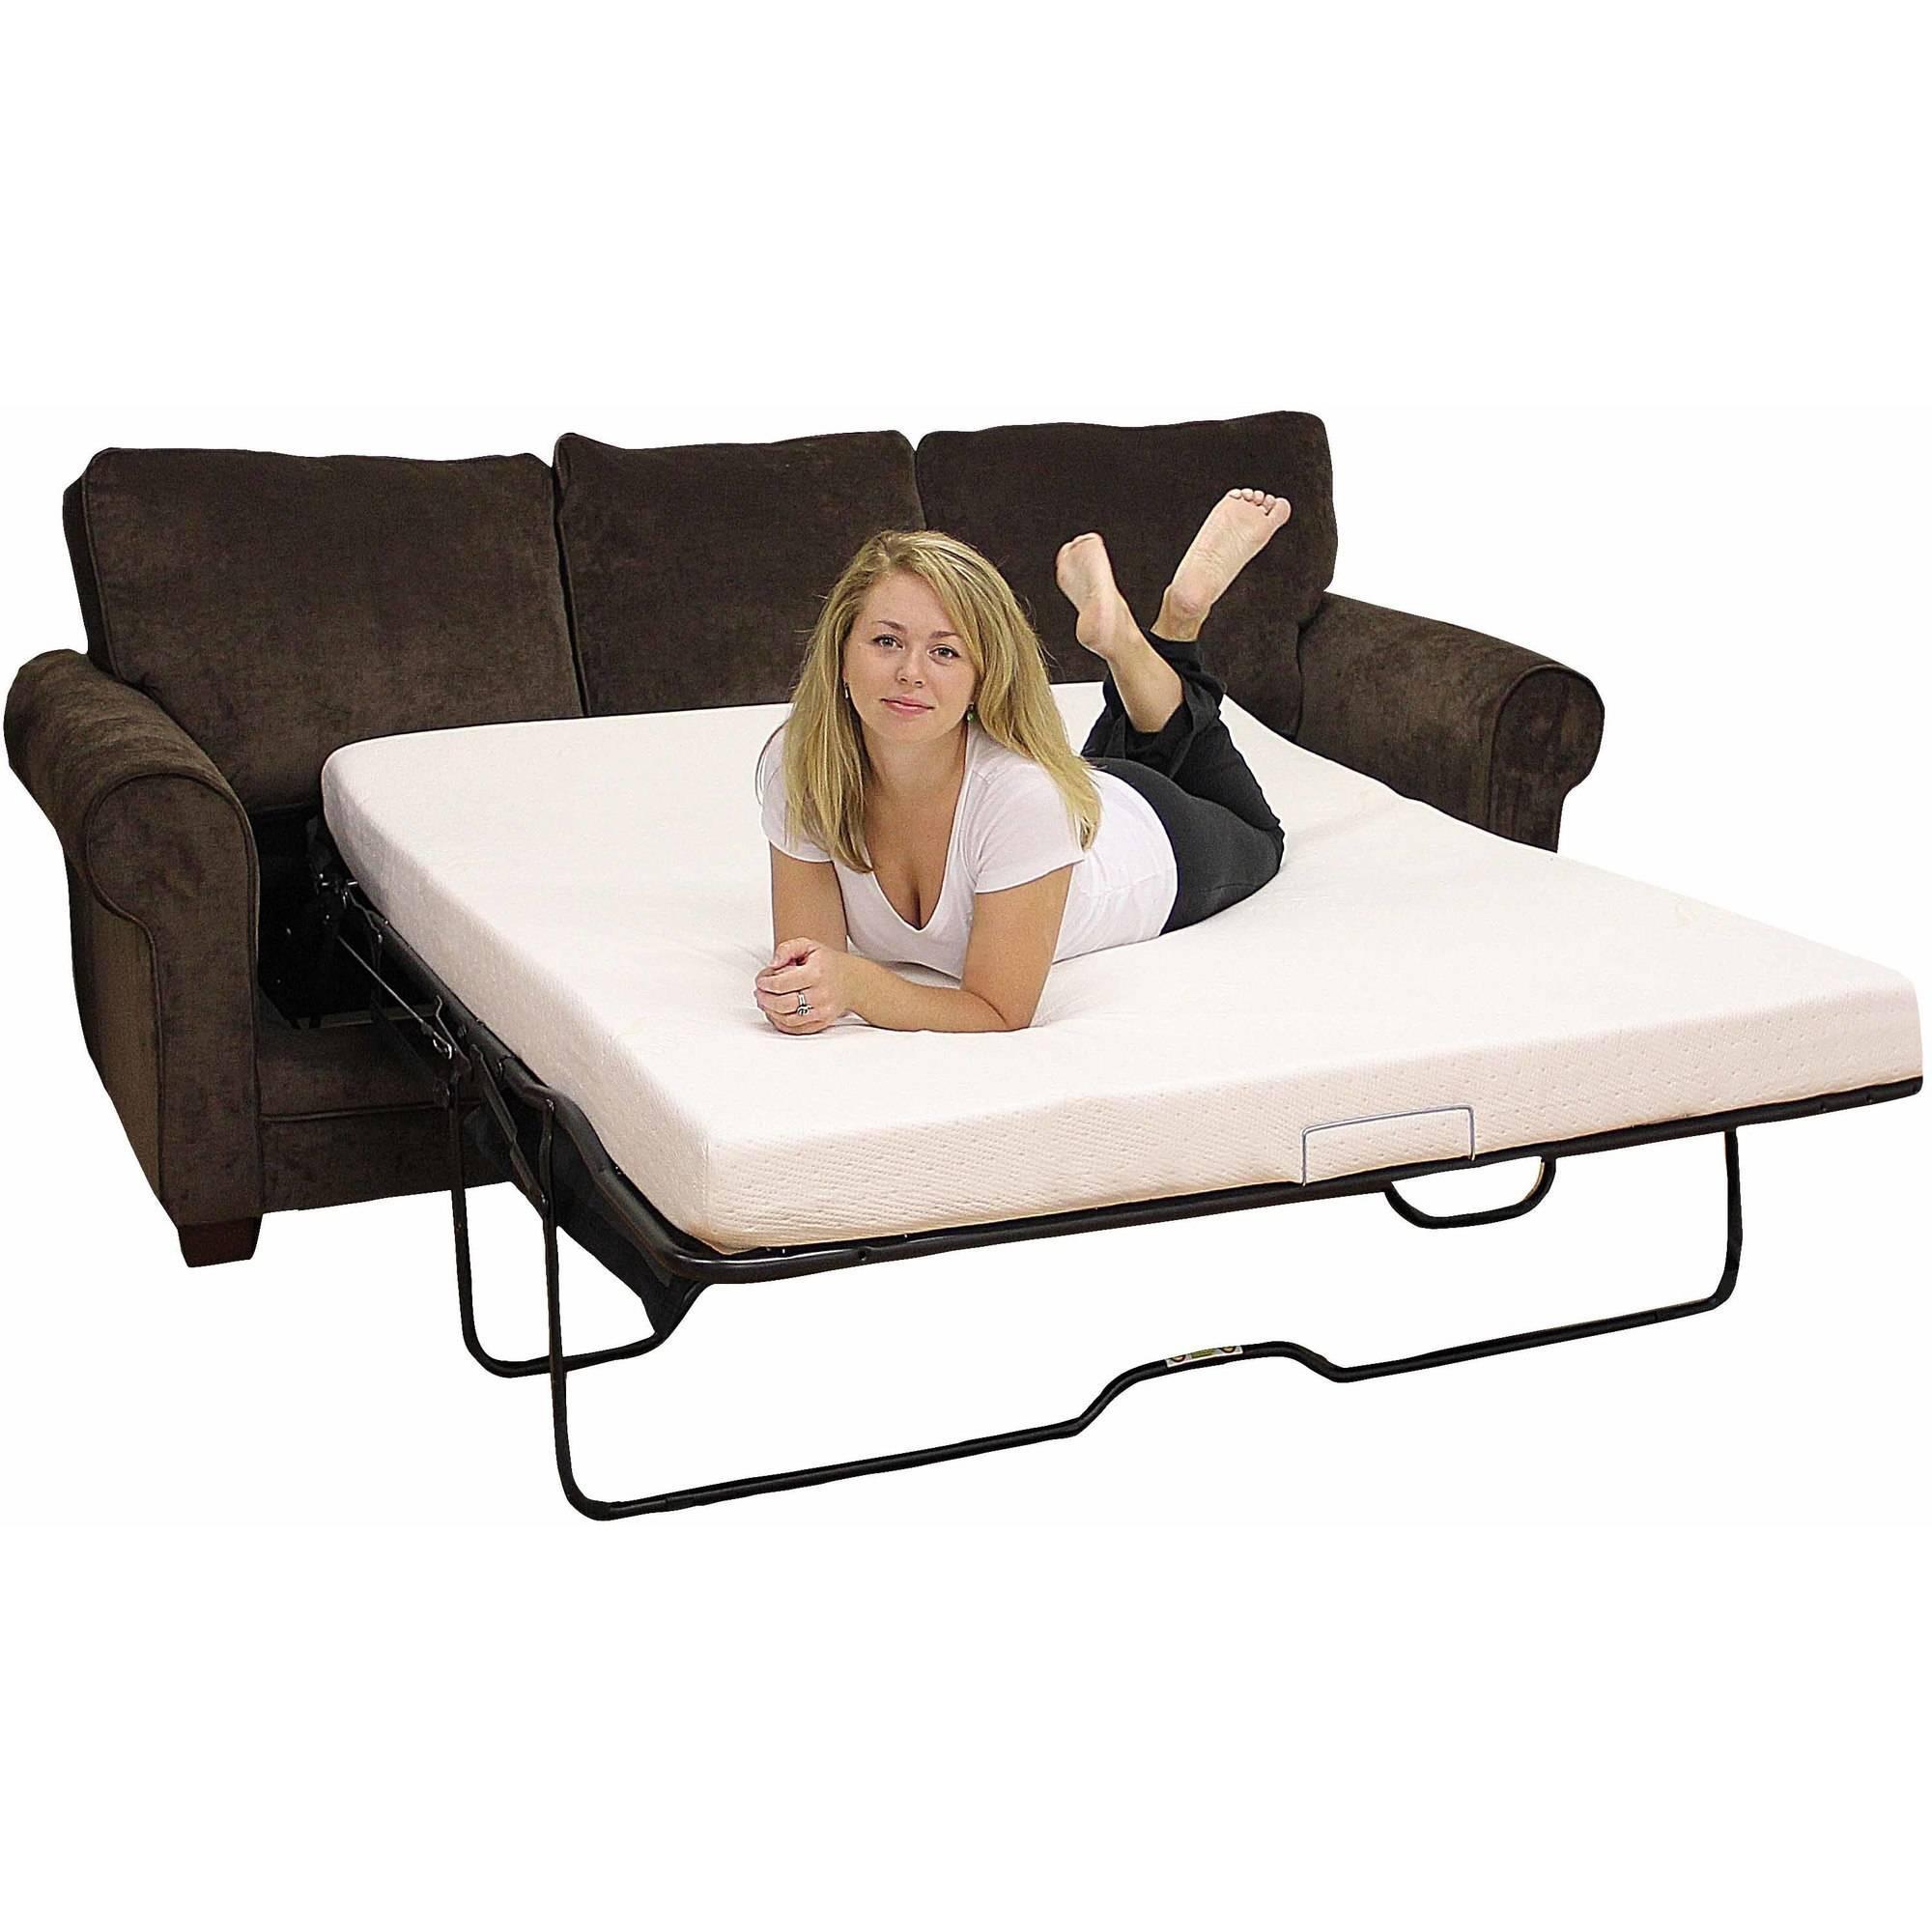 20 Top Sleep Number Sofa Beds Sofa Ideas